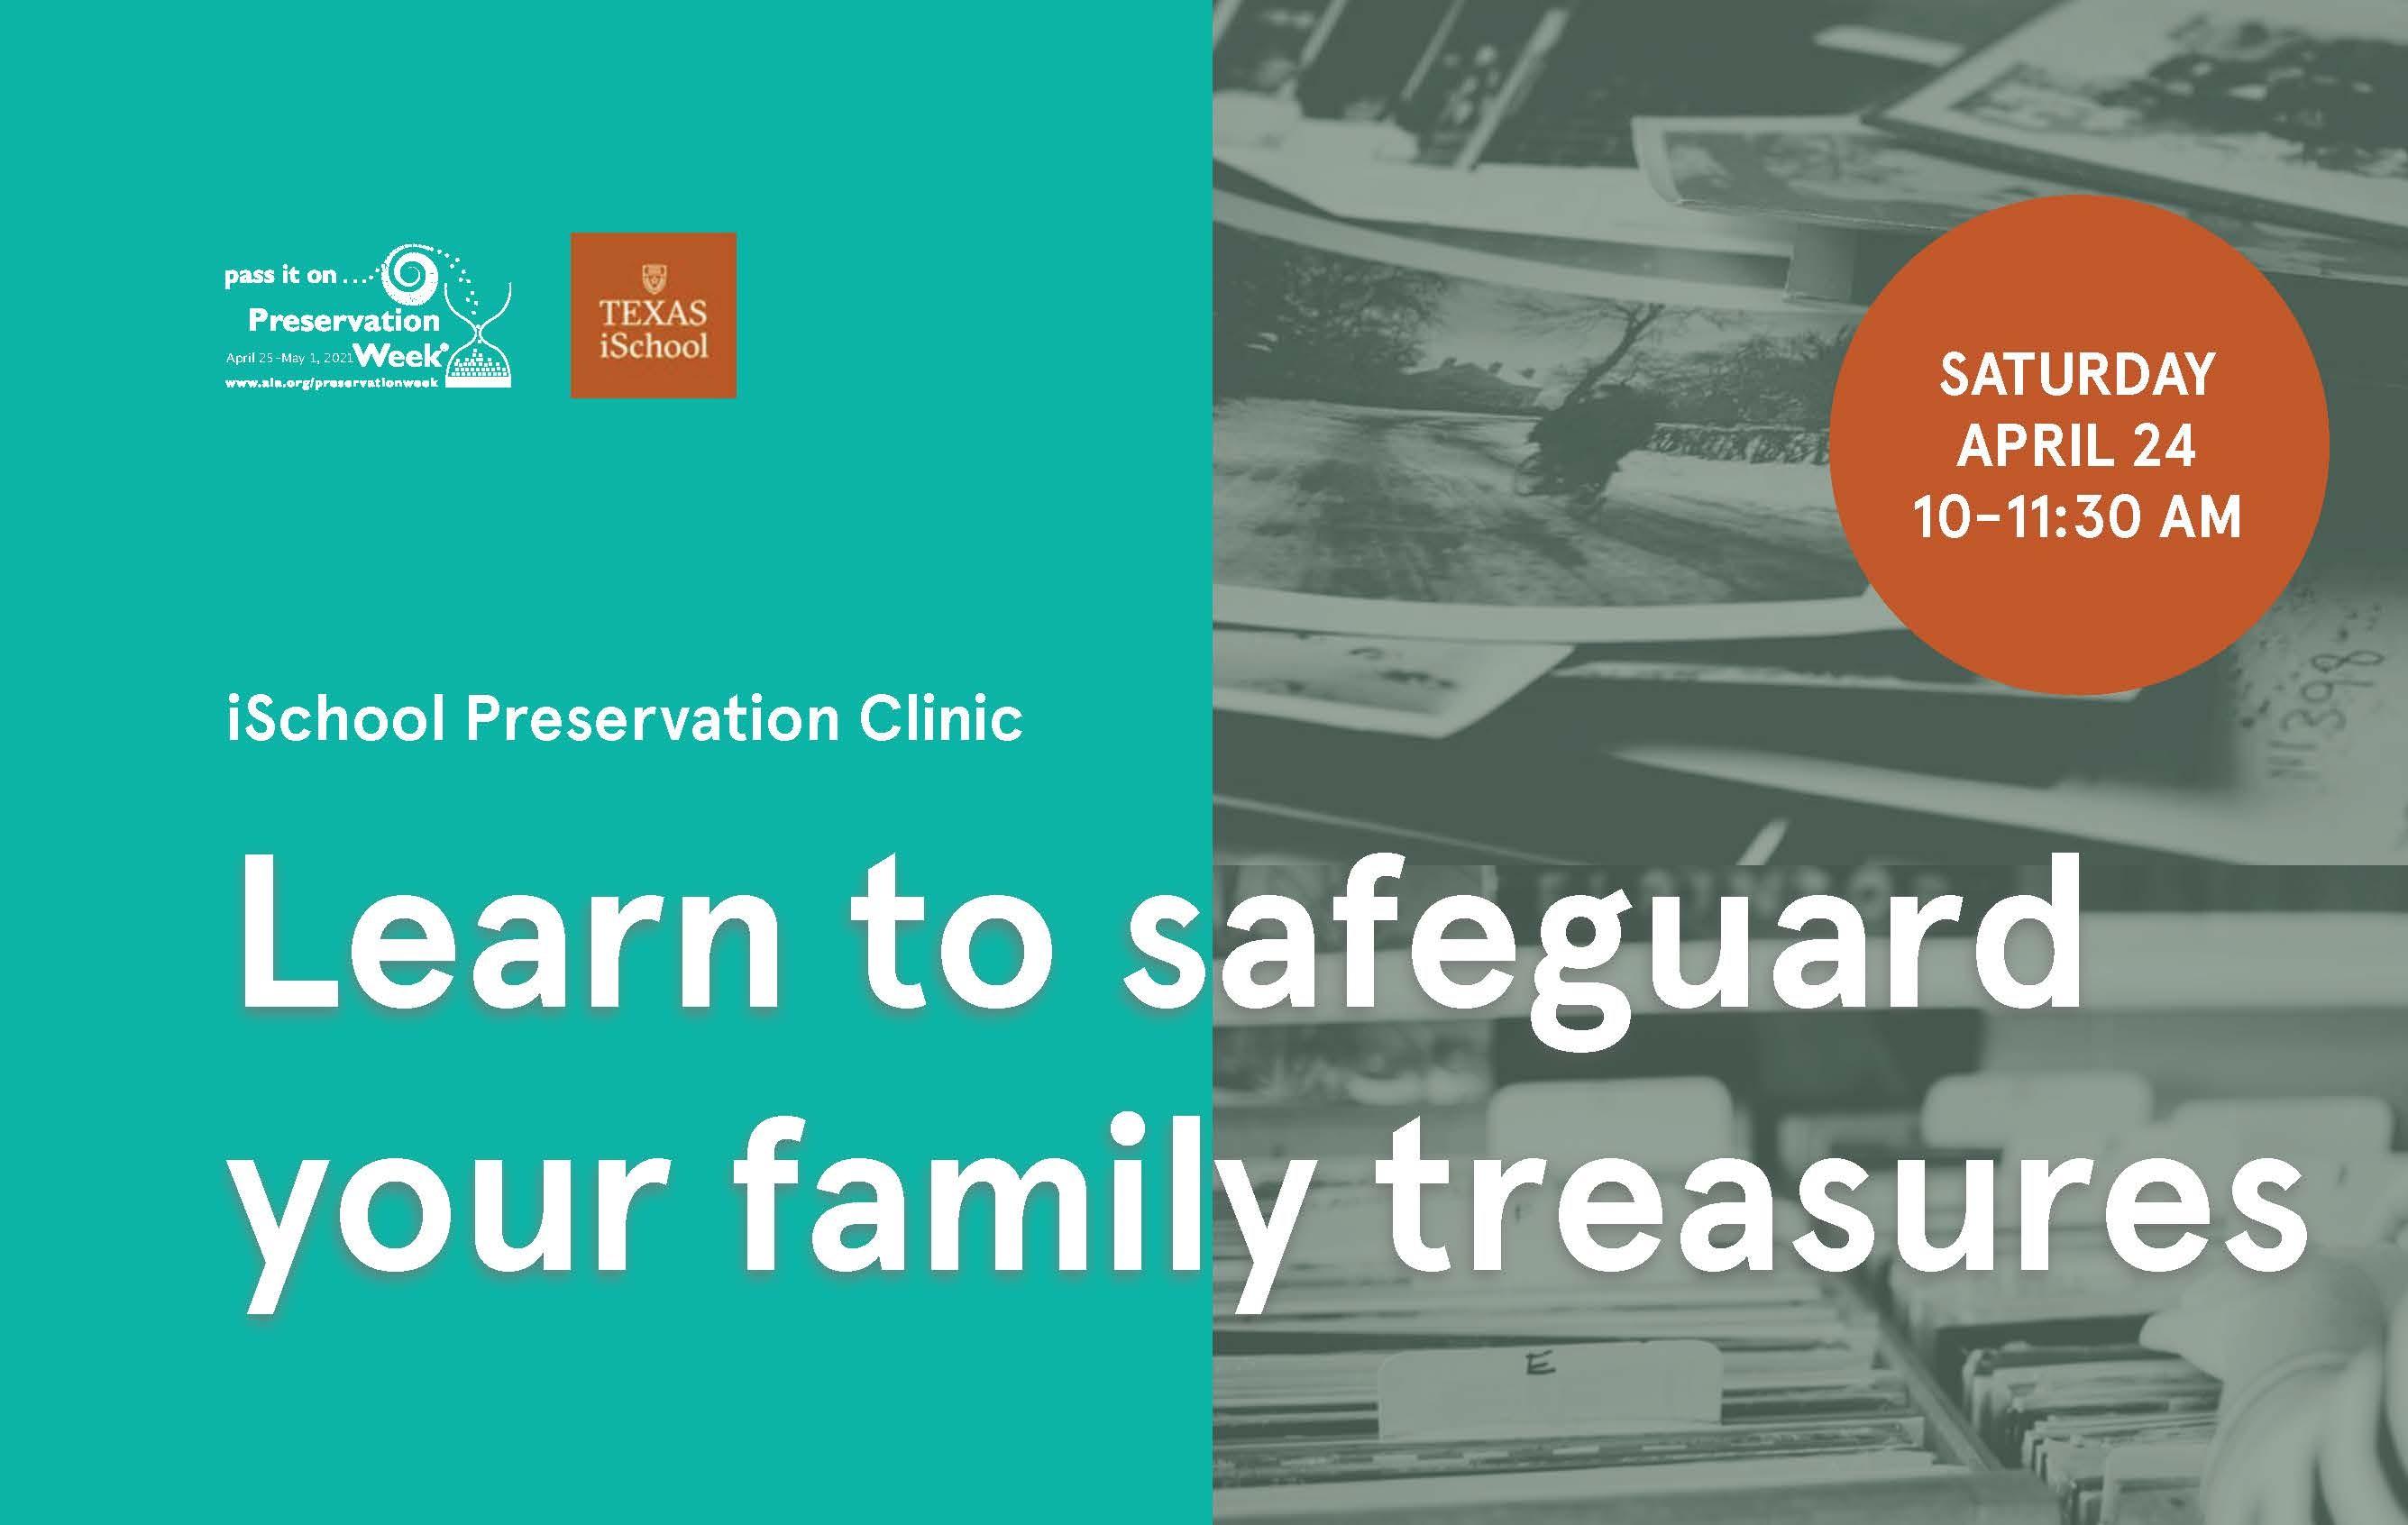 iSchool Preservation Clinic